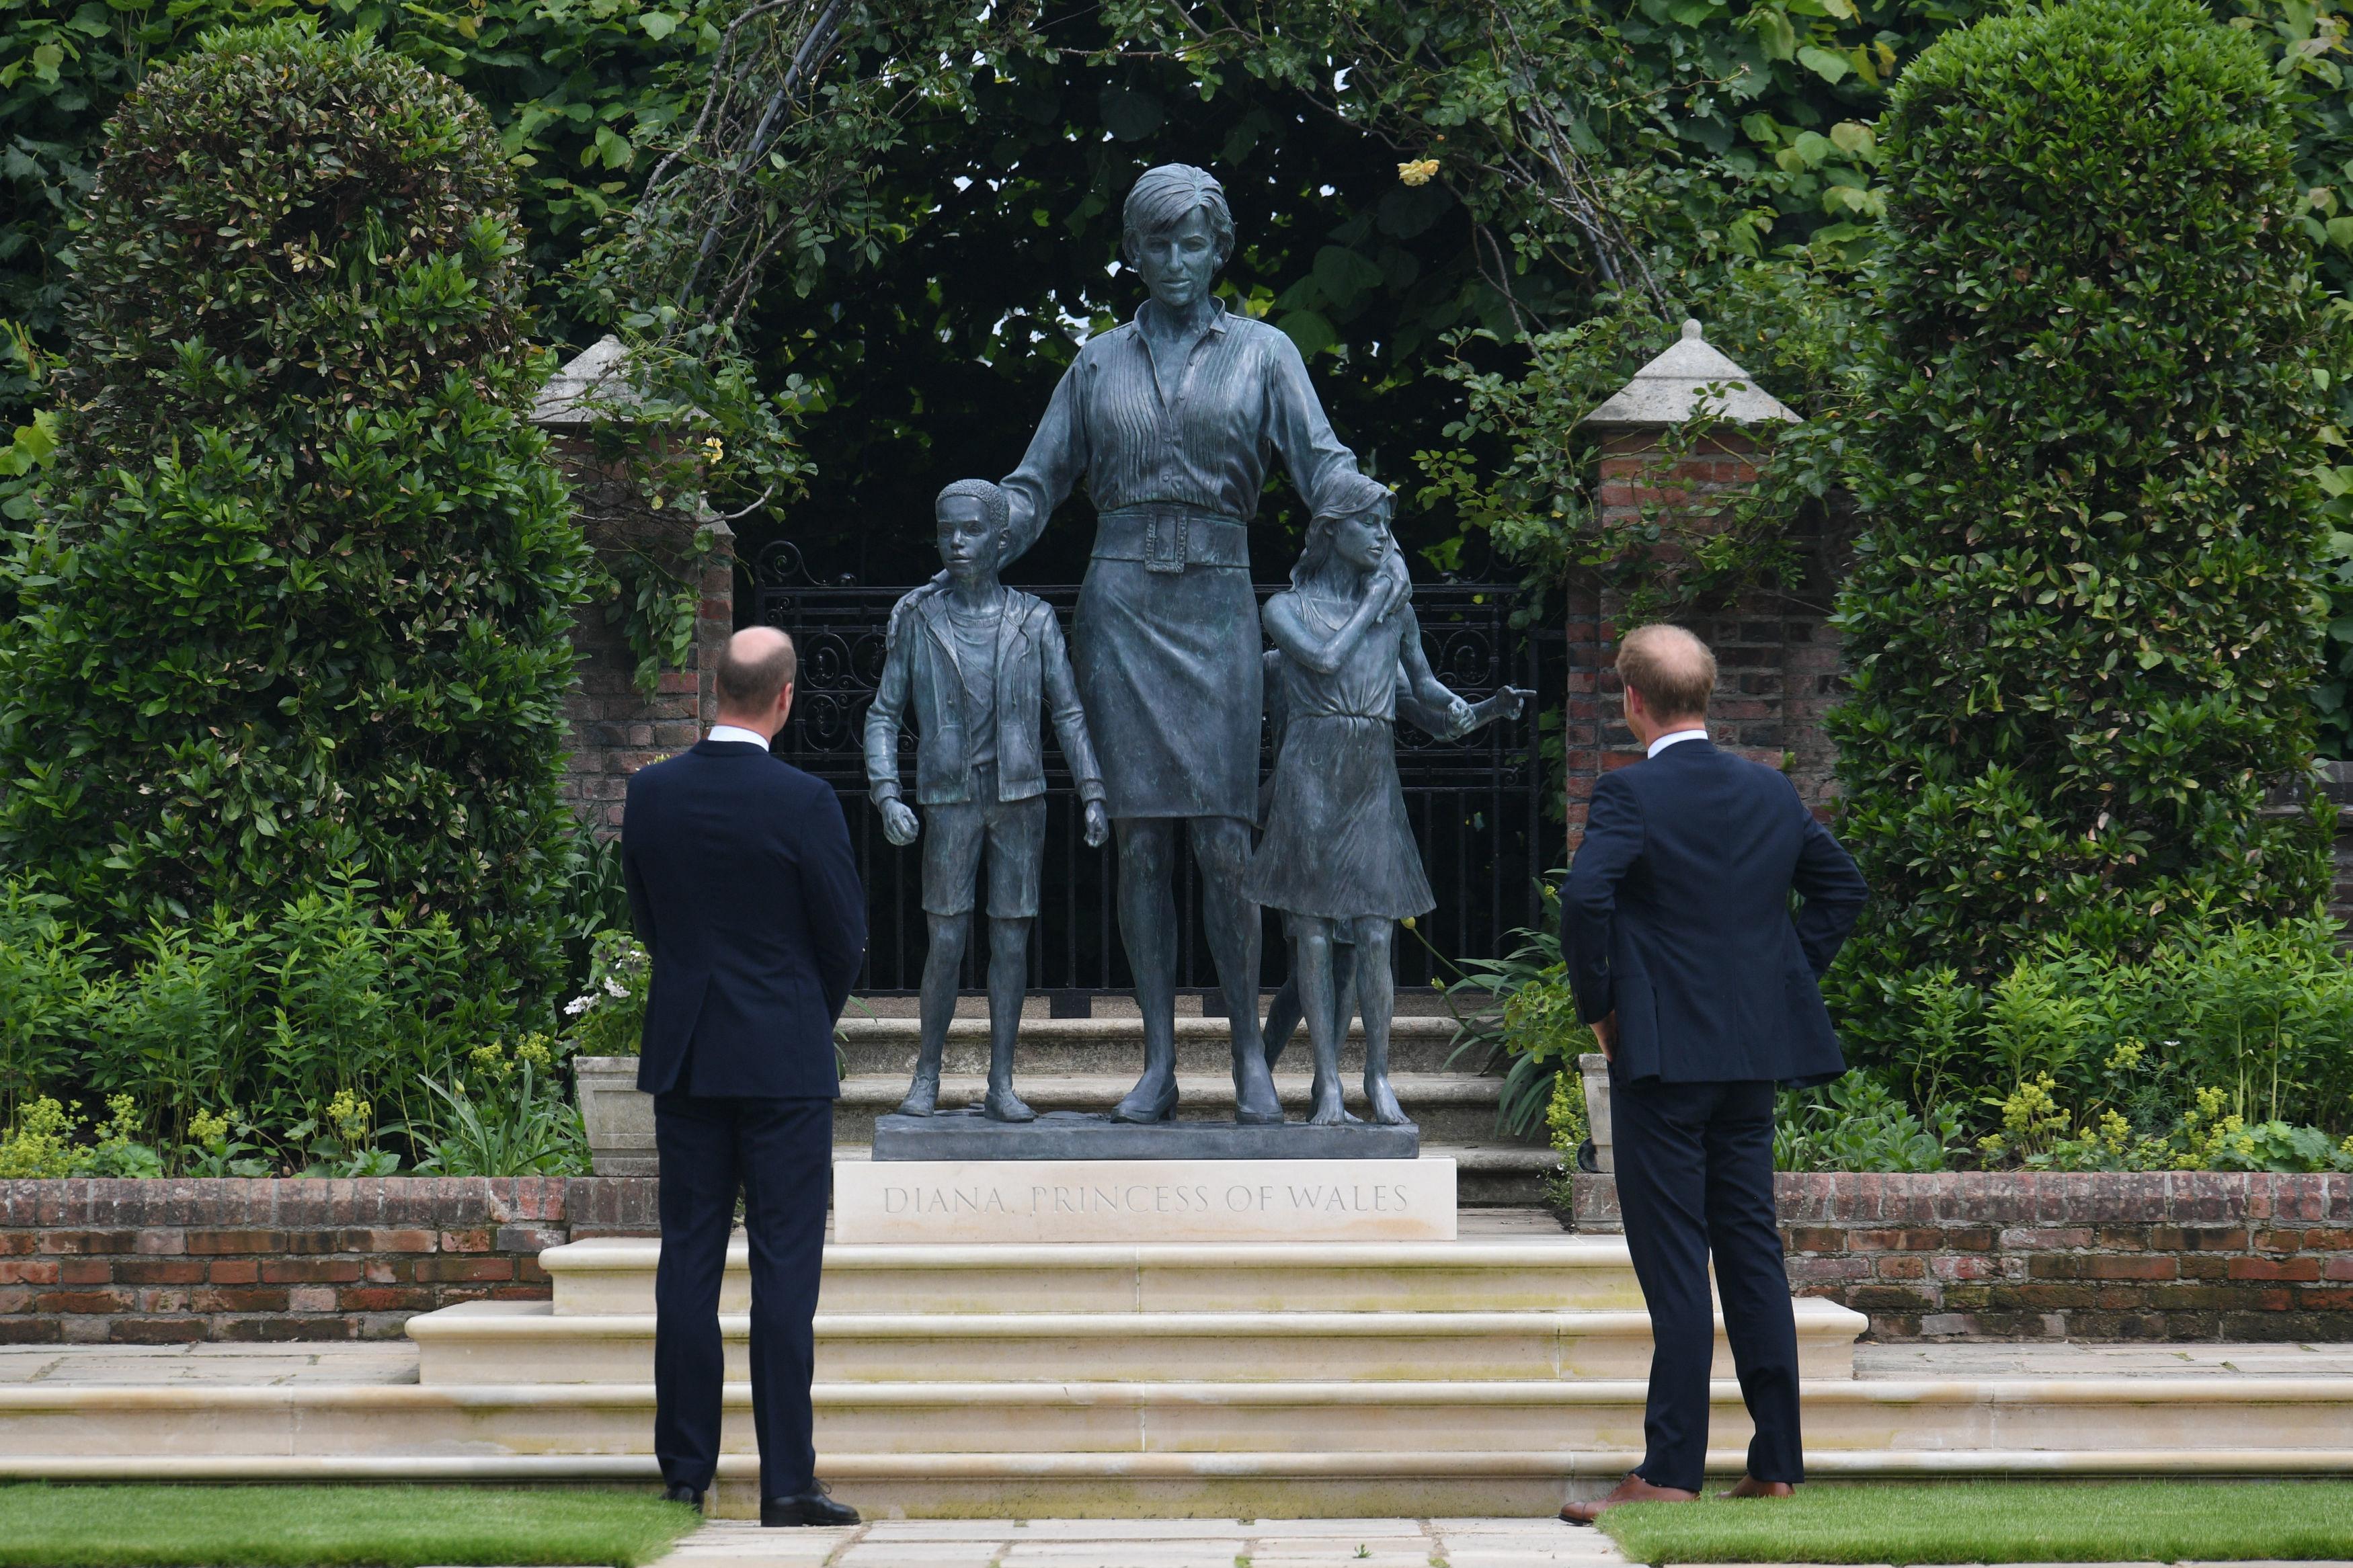 Inauguran la estatua de Diana